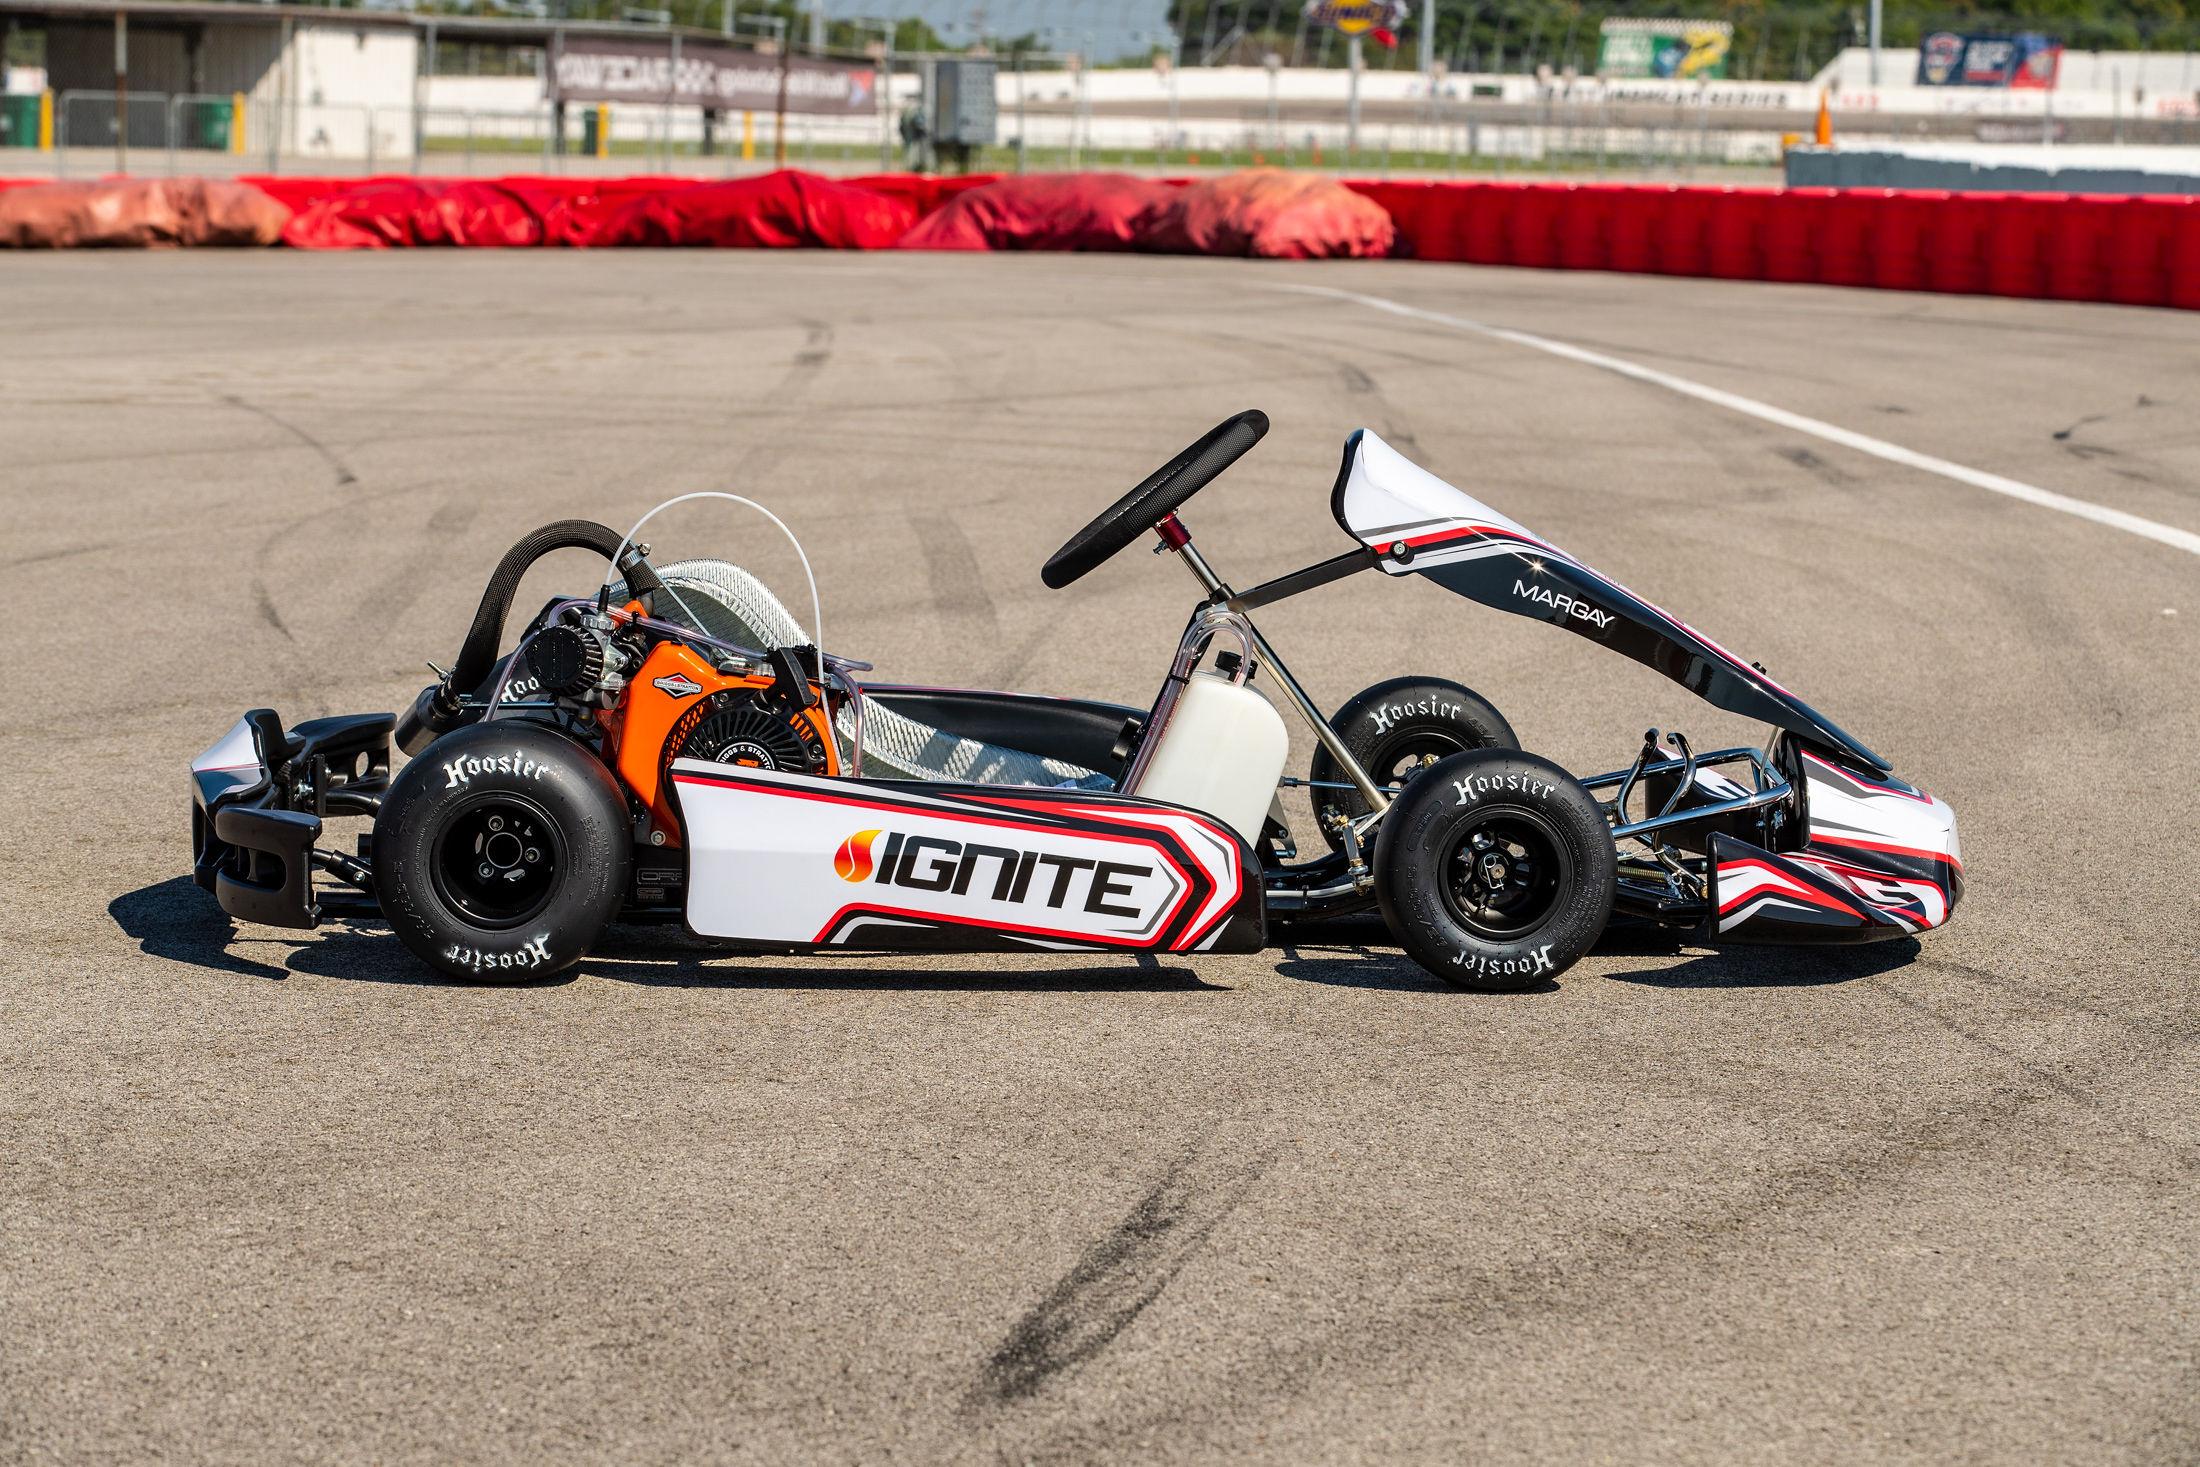 KG Mounting Kit For Air Box Go Kart Karting Race Racing